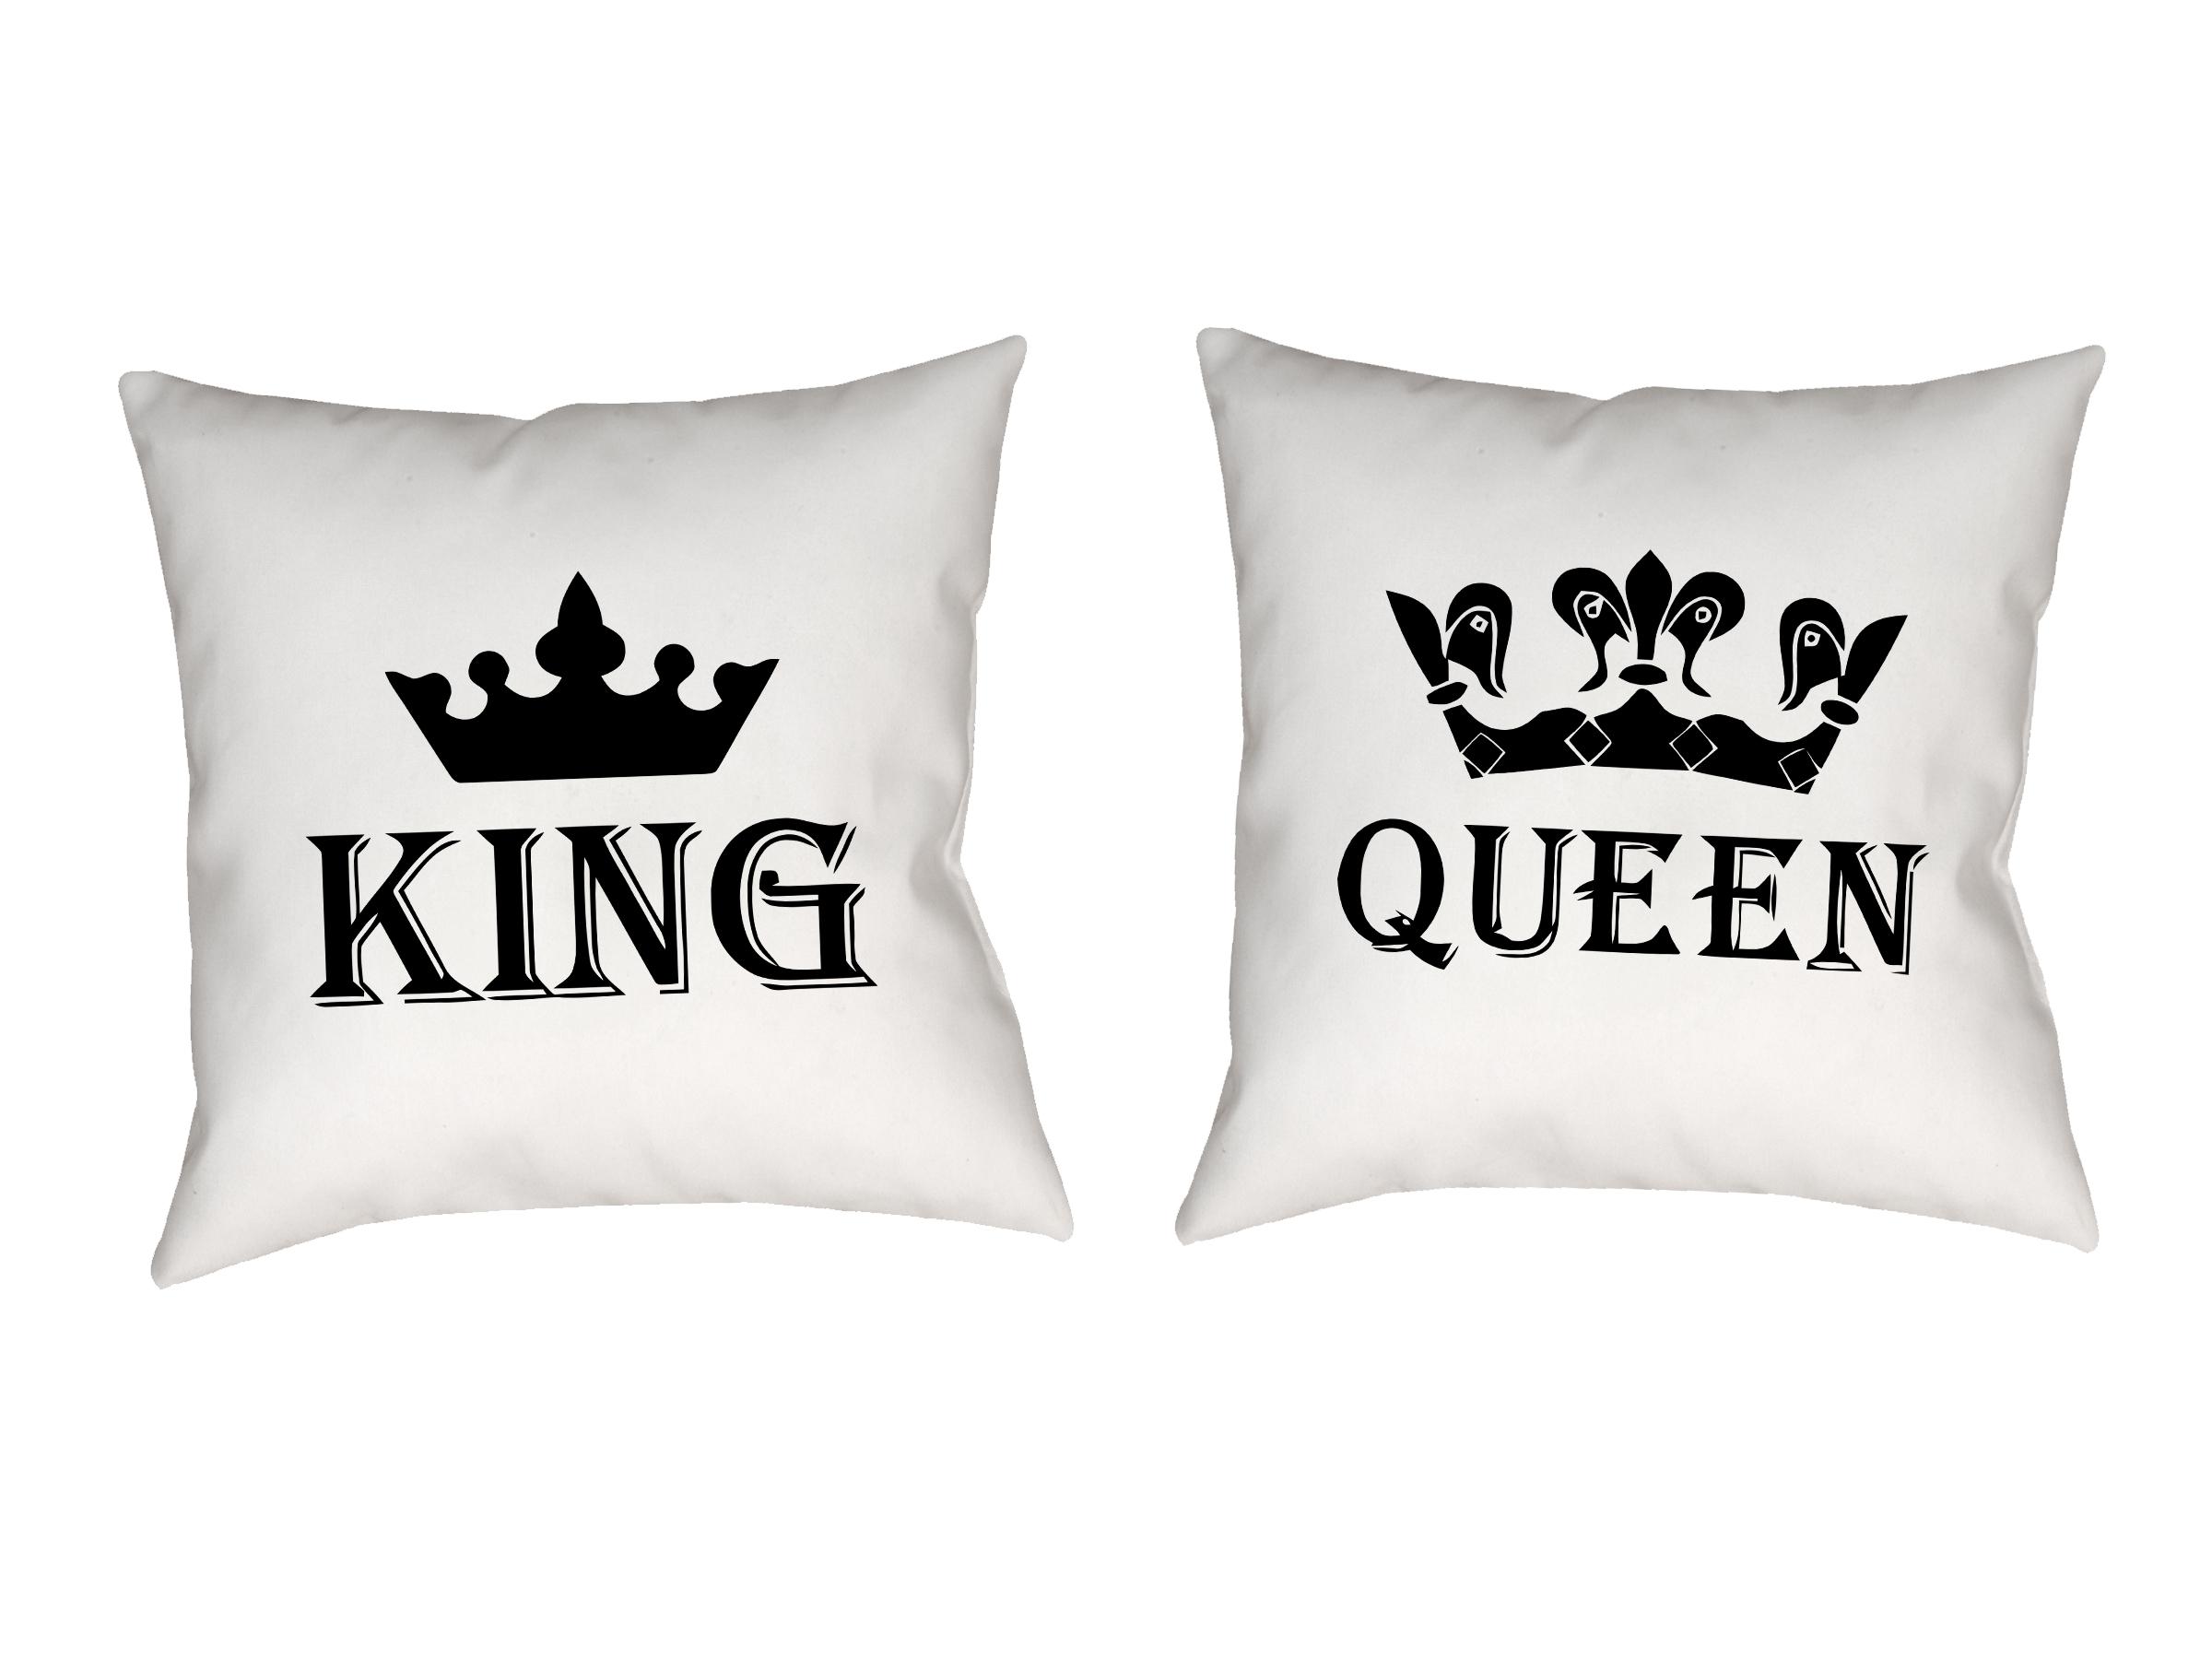 Poduszki Dla Par King Queen Prezent Duzo Wzorow 7018920926 Allegro Pl